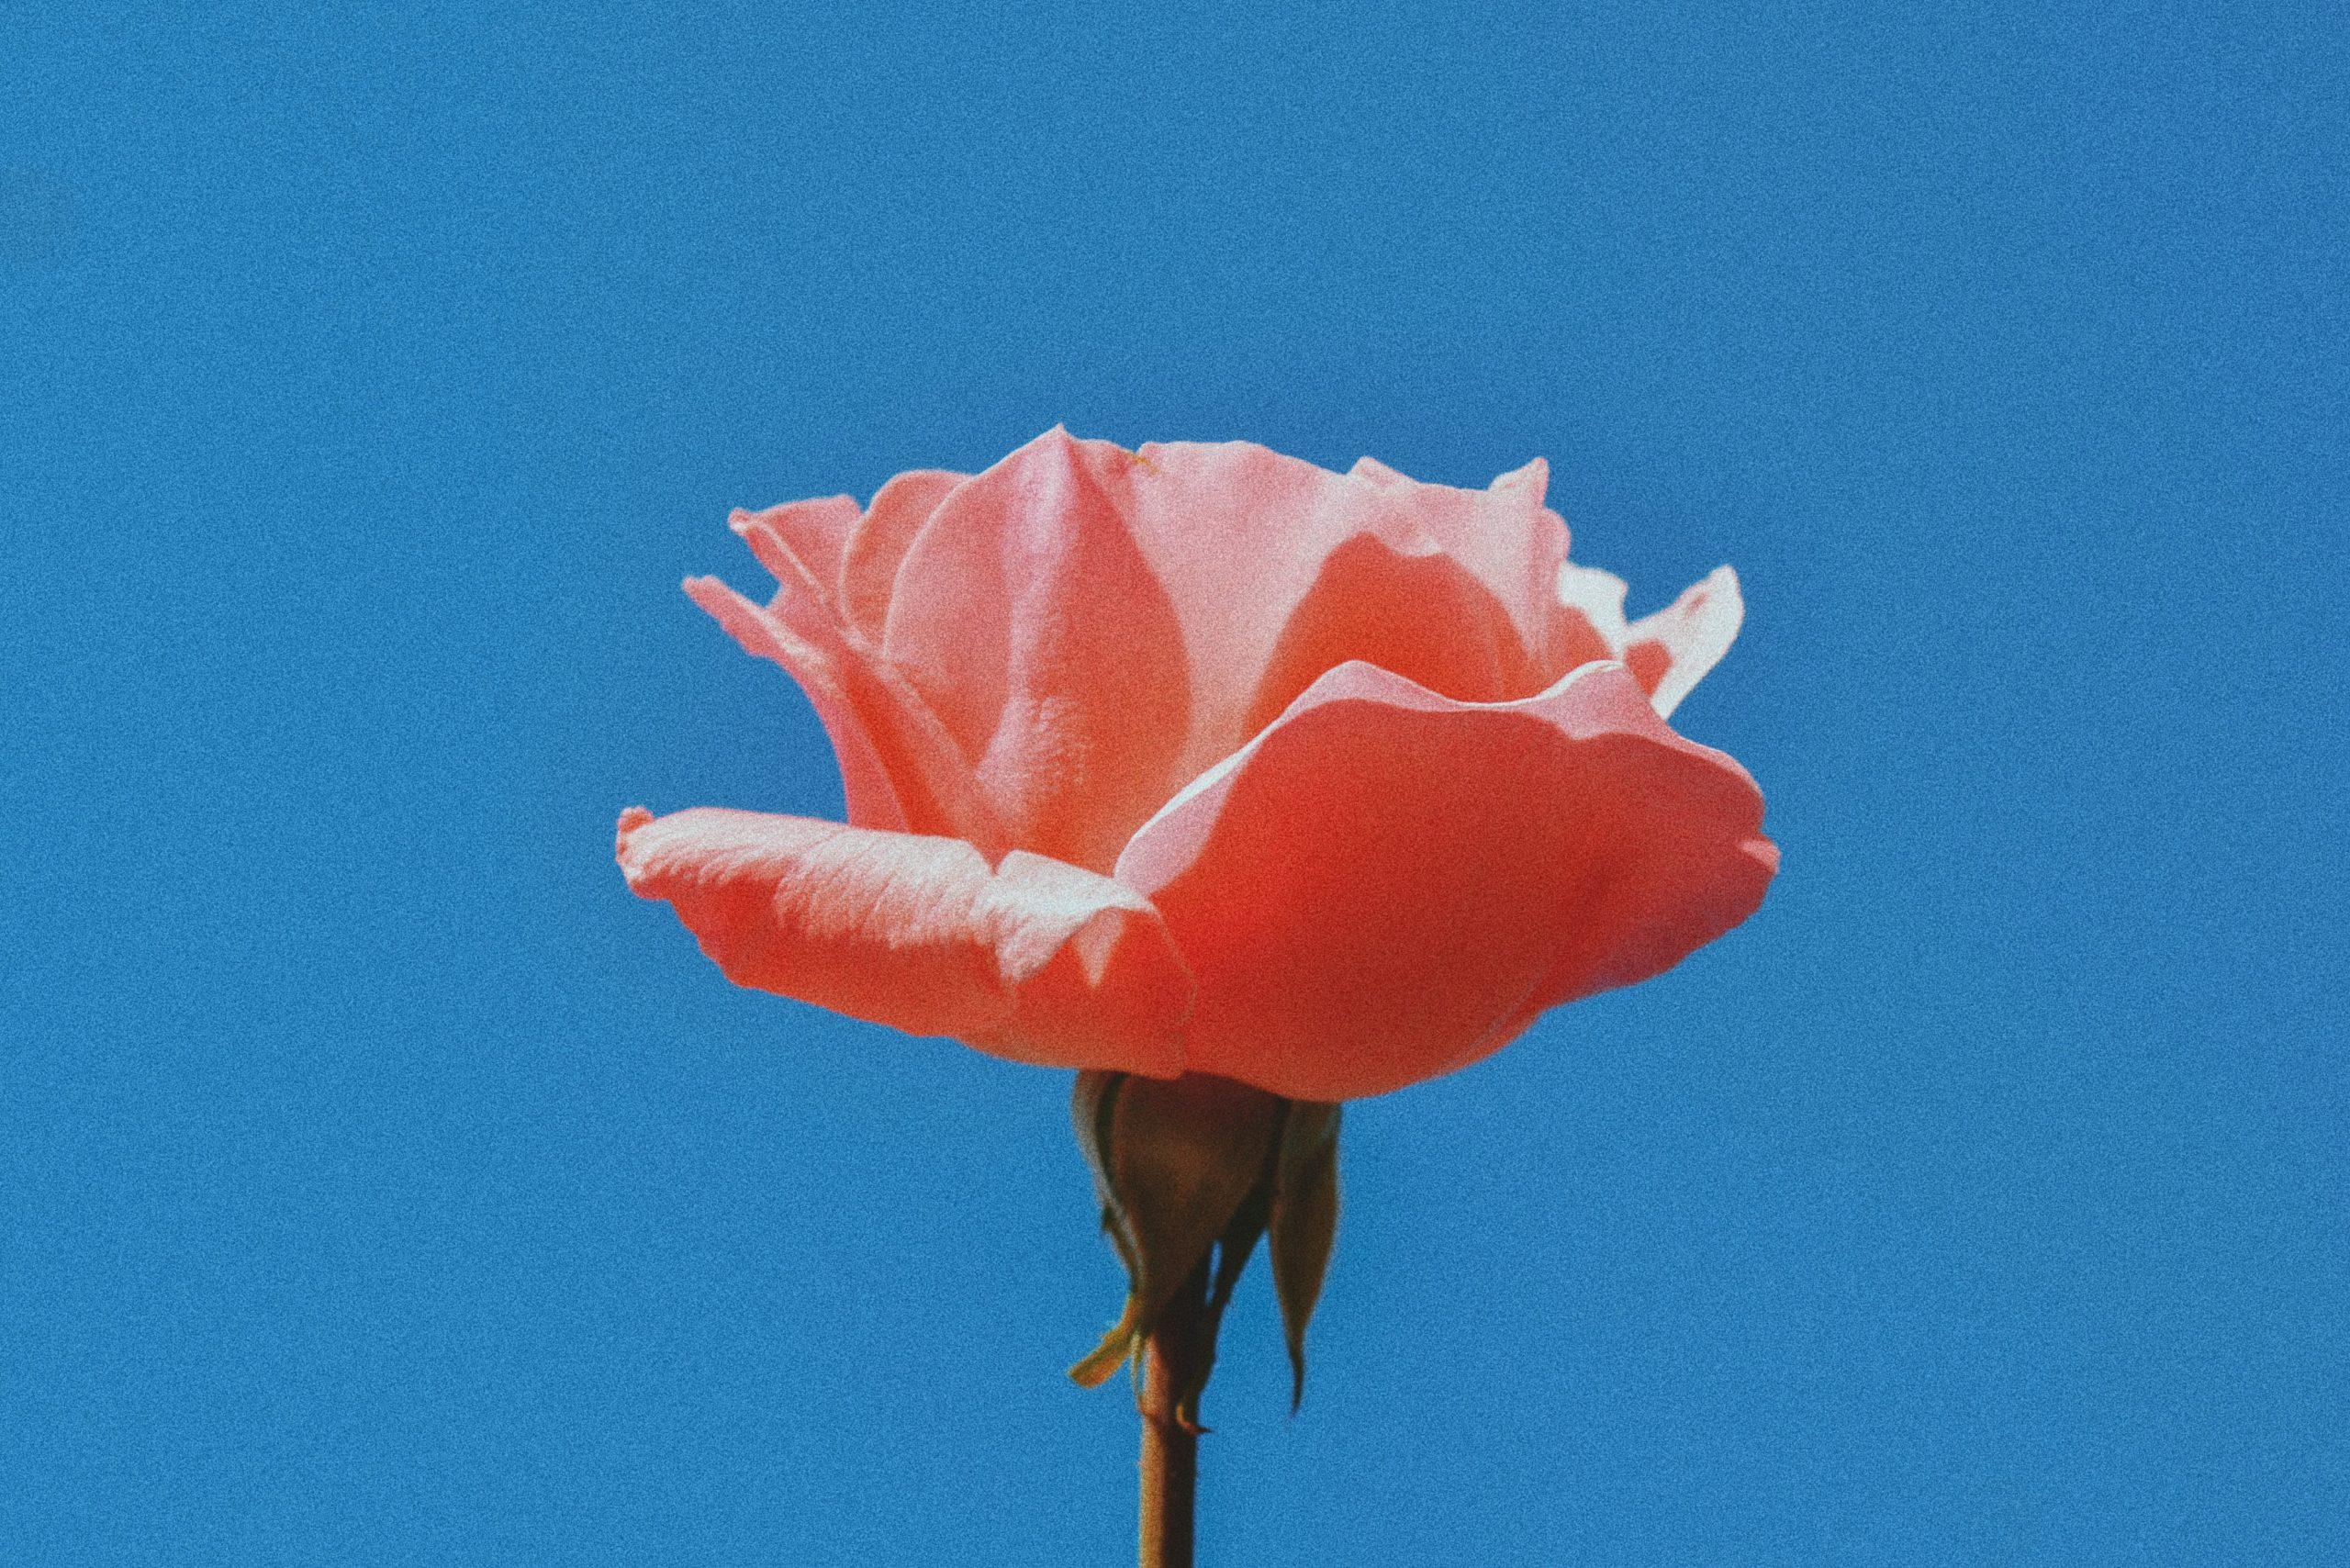 Aesthetic Wallpaper Pink Rose Aesthetic Wallpaper Wallpaper For You The Best Wallpaper For Desktop Mobile